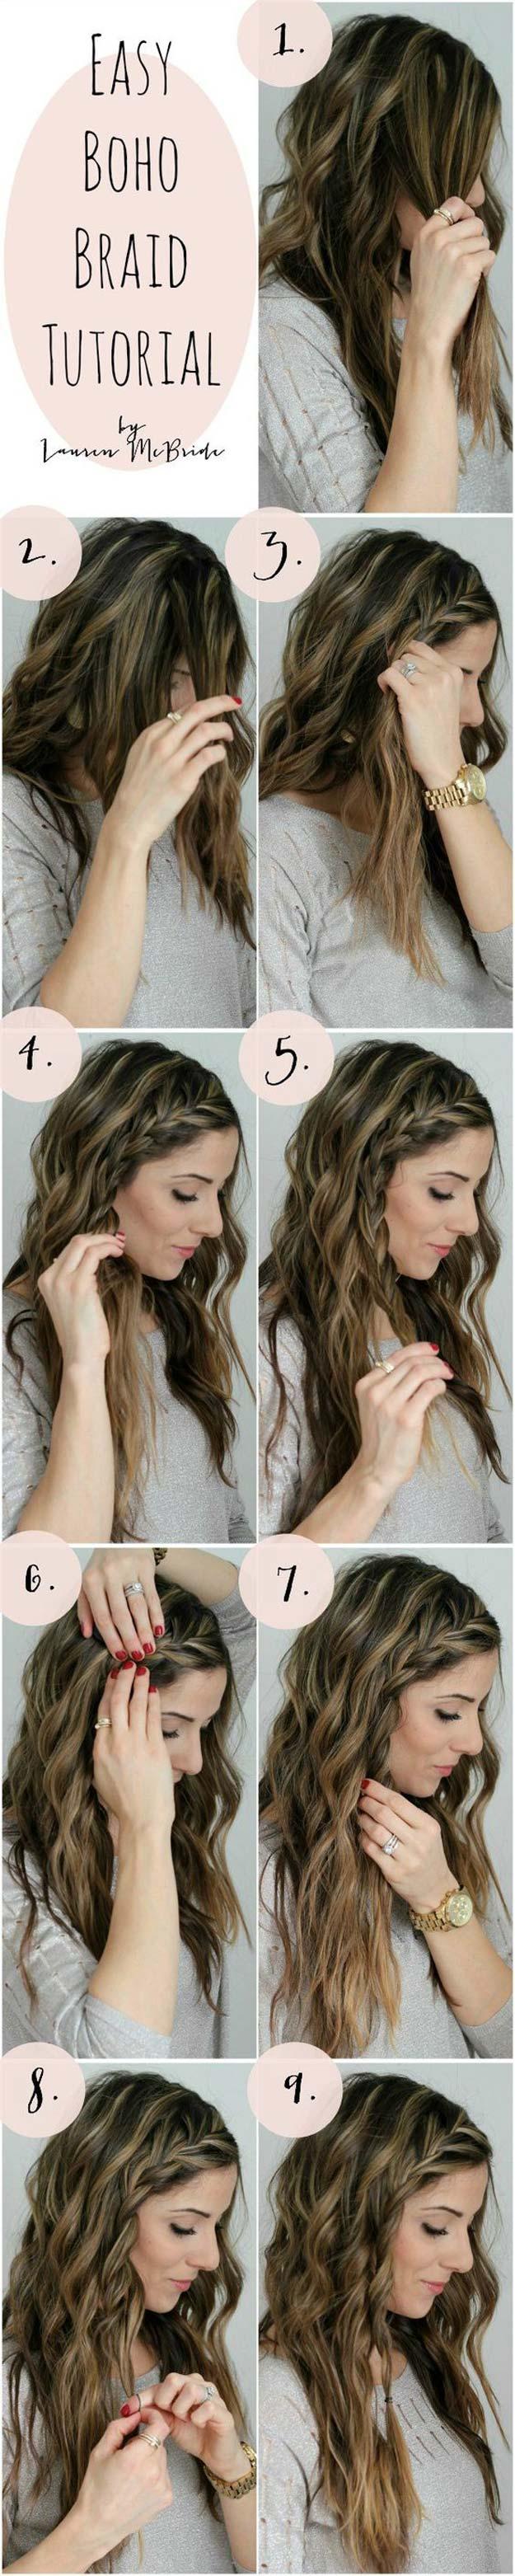 Best Hair Braiding Tutorials - Easy Boho Braid Tutorial - Easy Step by Step Tutorials for Braids - How To Braid Fishtail, French Braids, Flower Crown, Side Braids, Cornrows, Updos - Cool Braided Hairstyles for Girls, Teens and Women - School, Day and Evening, Boho, Casual and Formal Looks #hairstyles #braiding #braidingtutorials #diyhair